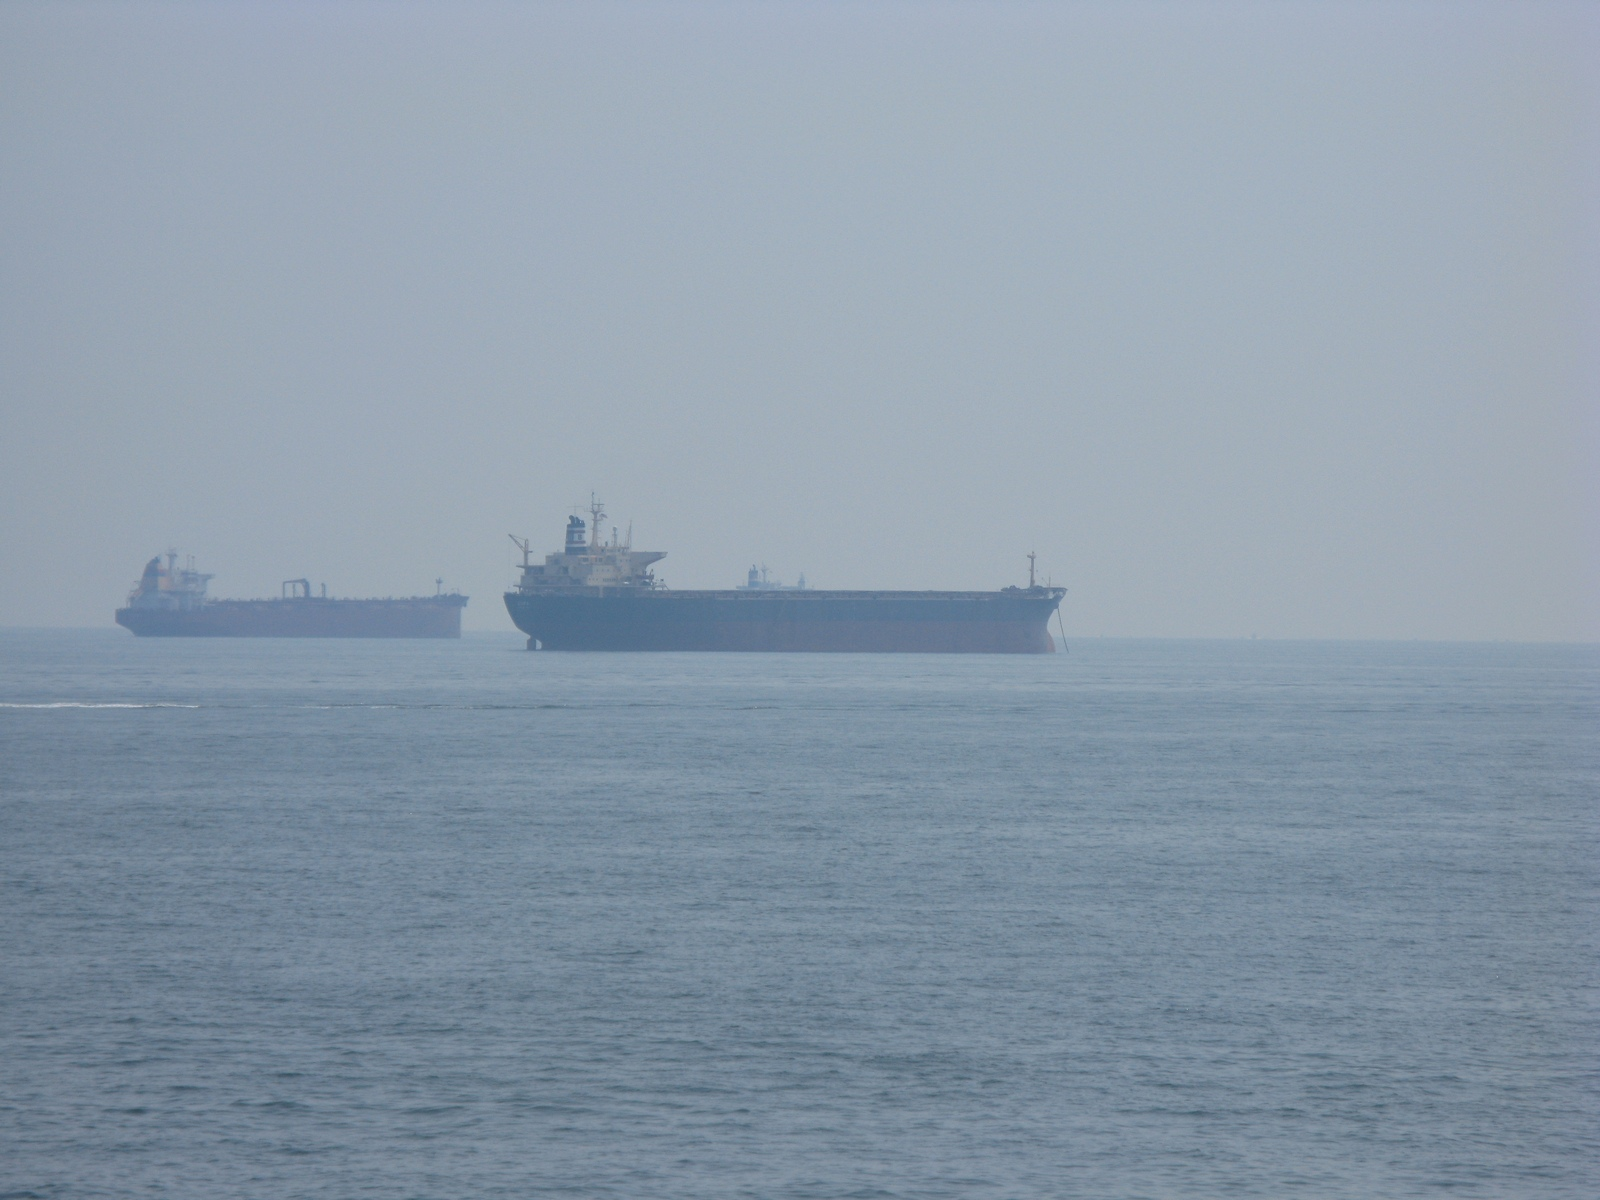 chesapeake_bridge_freighters.jpg